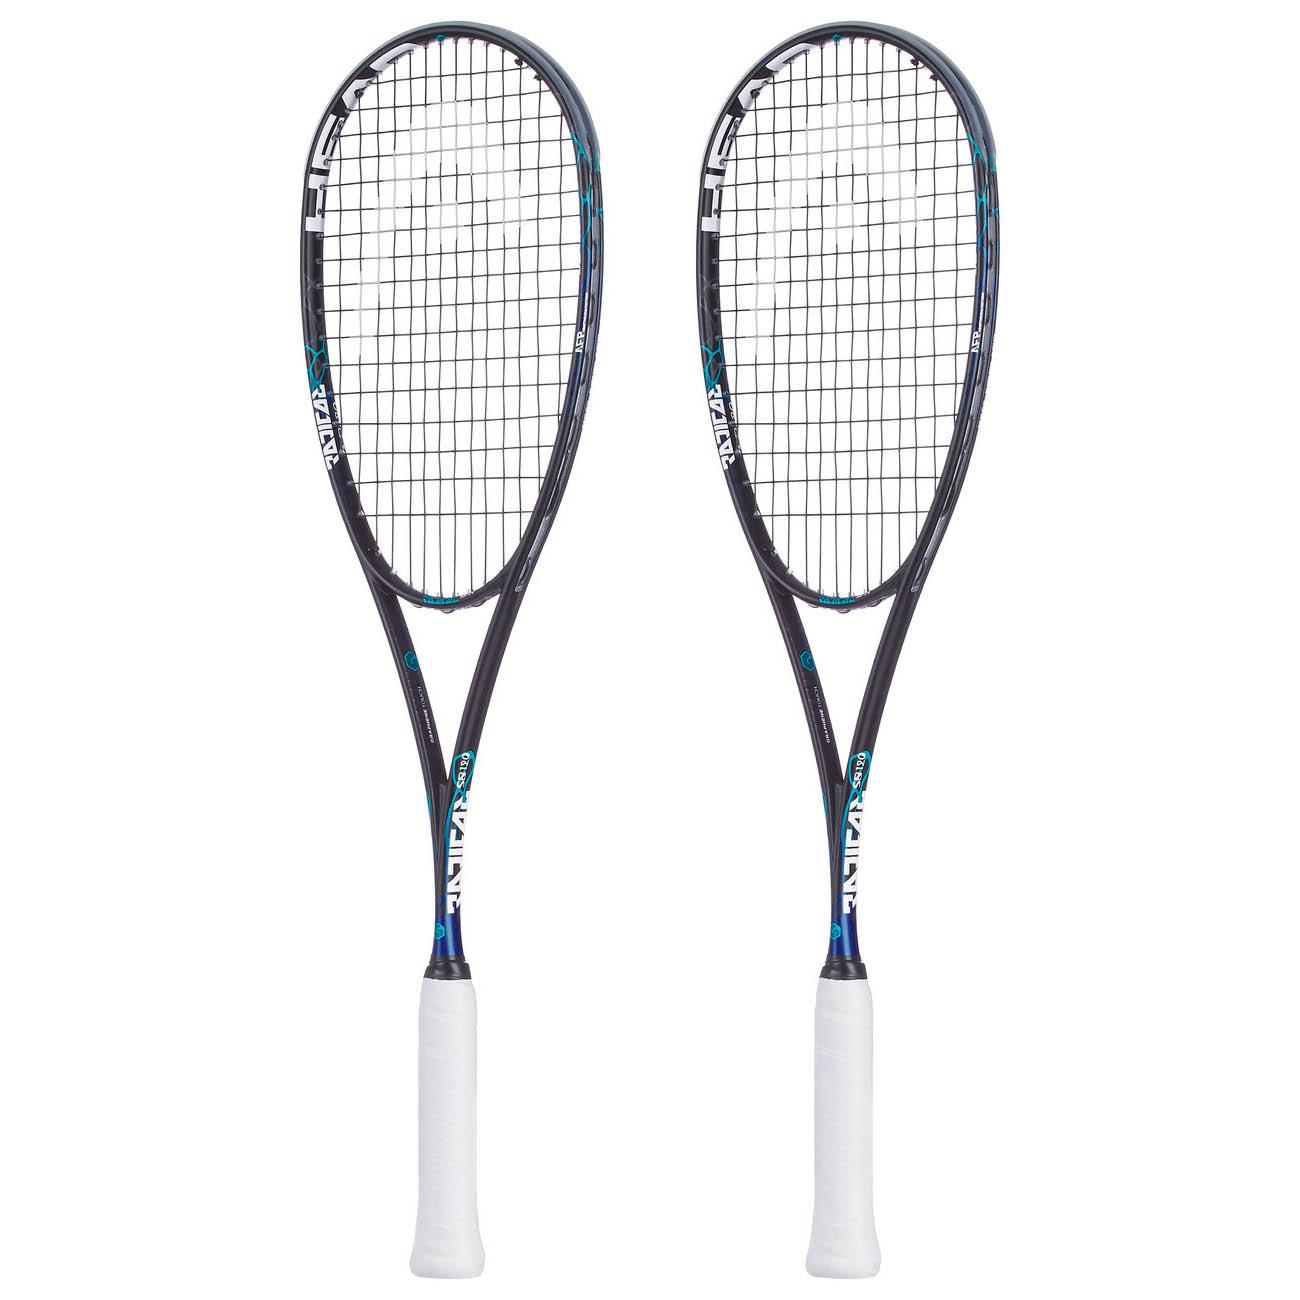 Head Graphene Touch Radical 120 Slimbody Squash Racket Double Pack